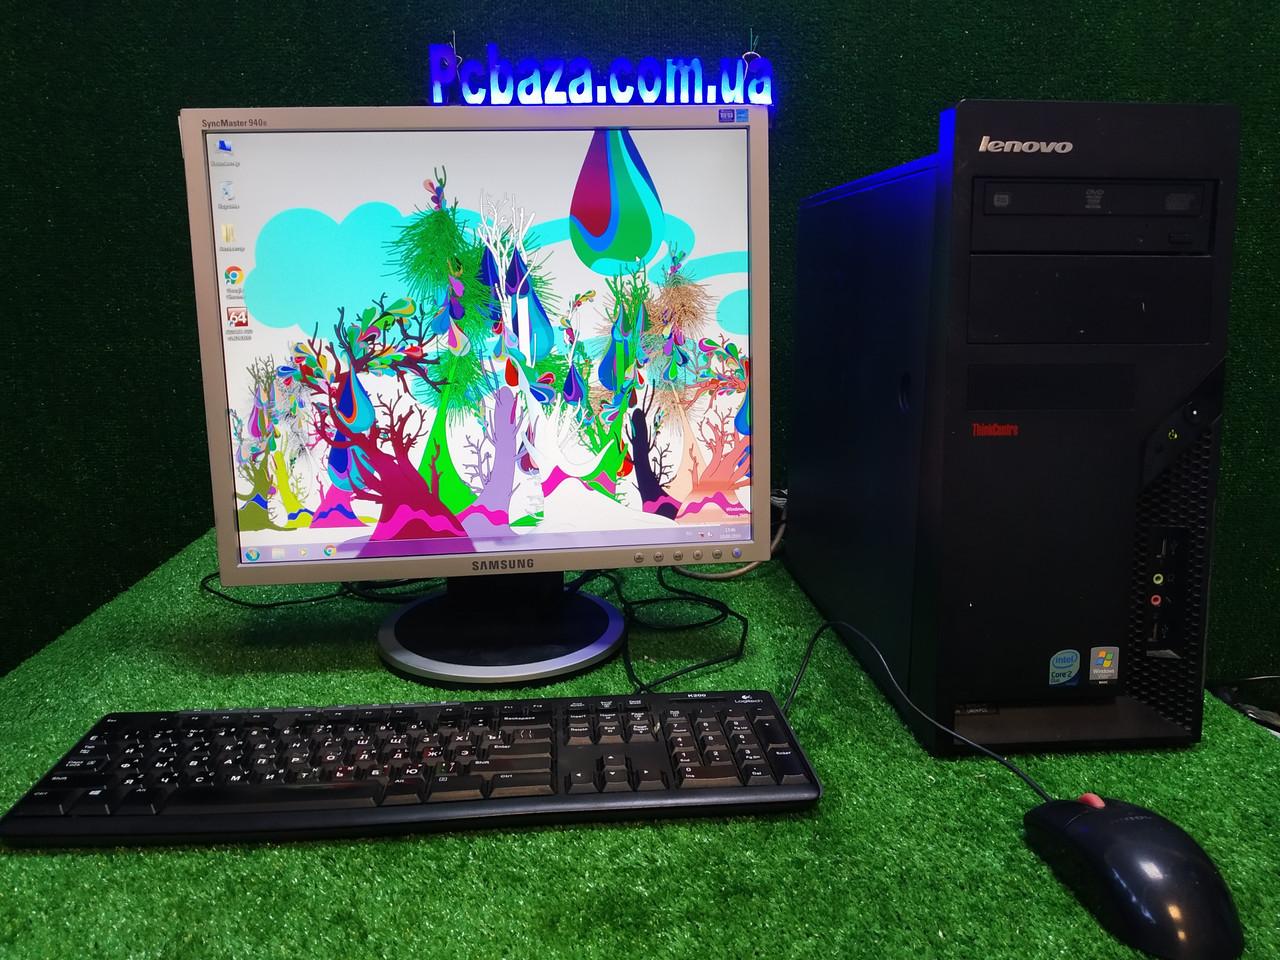 "Комплект настроенный Lenovo, 4 ядра, 4 ГБ, 500 Гб HDD +монитор 19"" Samsung"